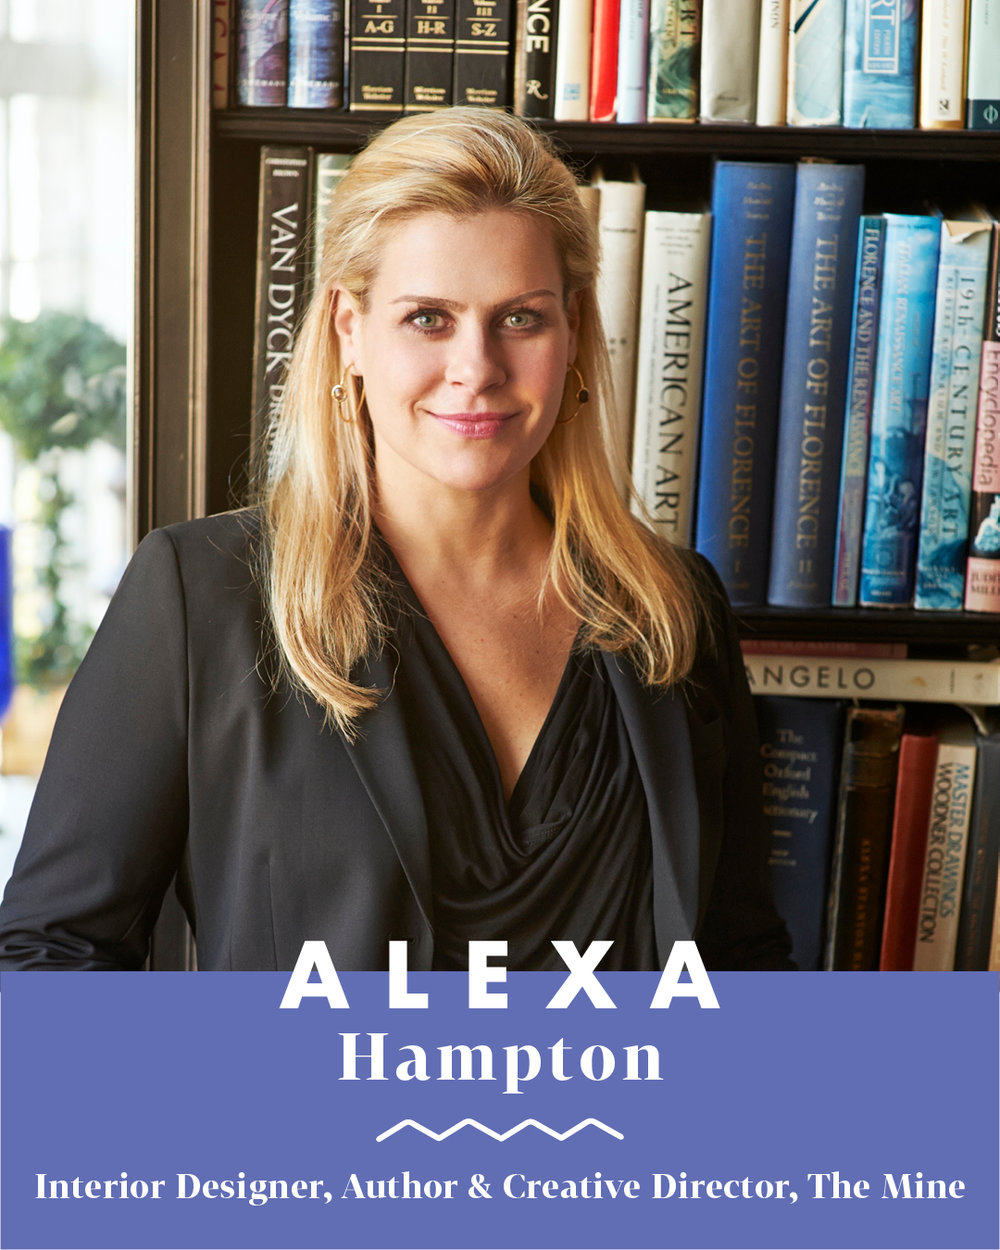 Alexa-hampton.jpg